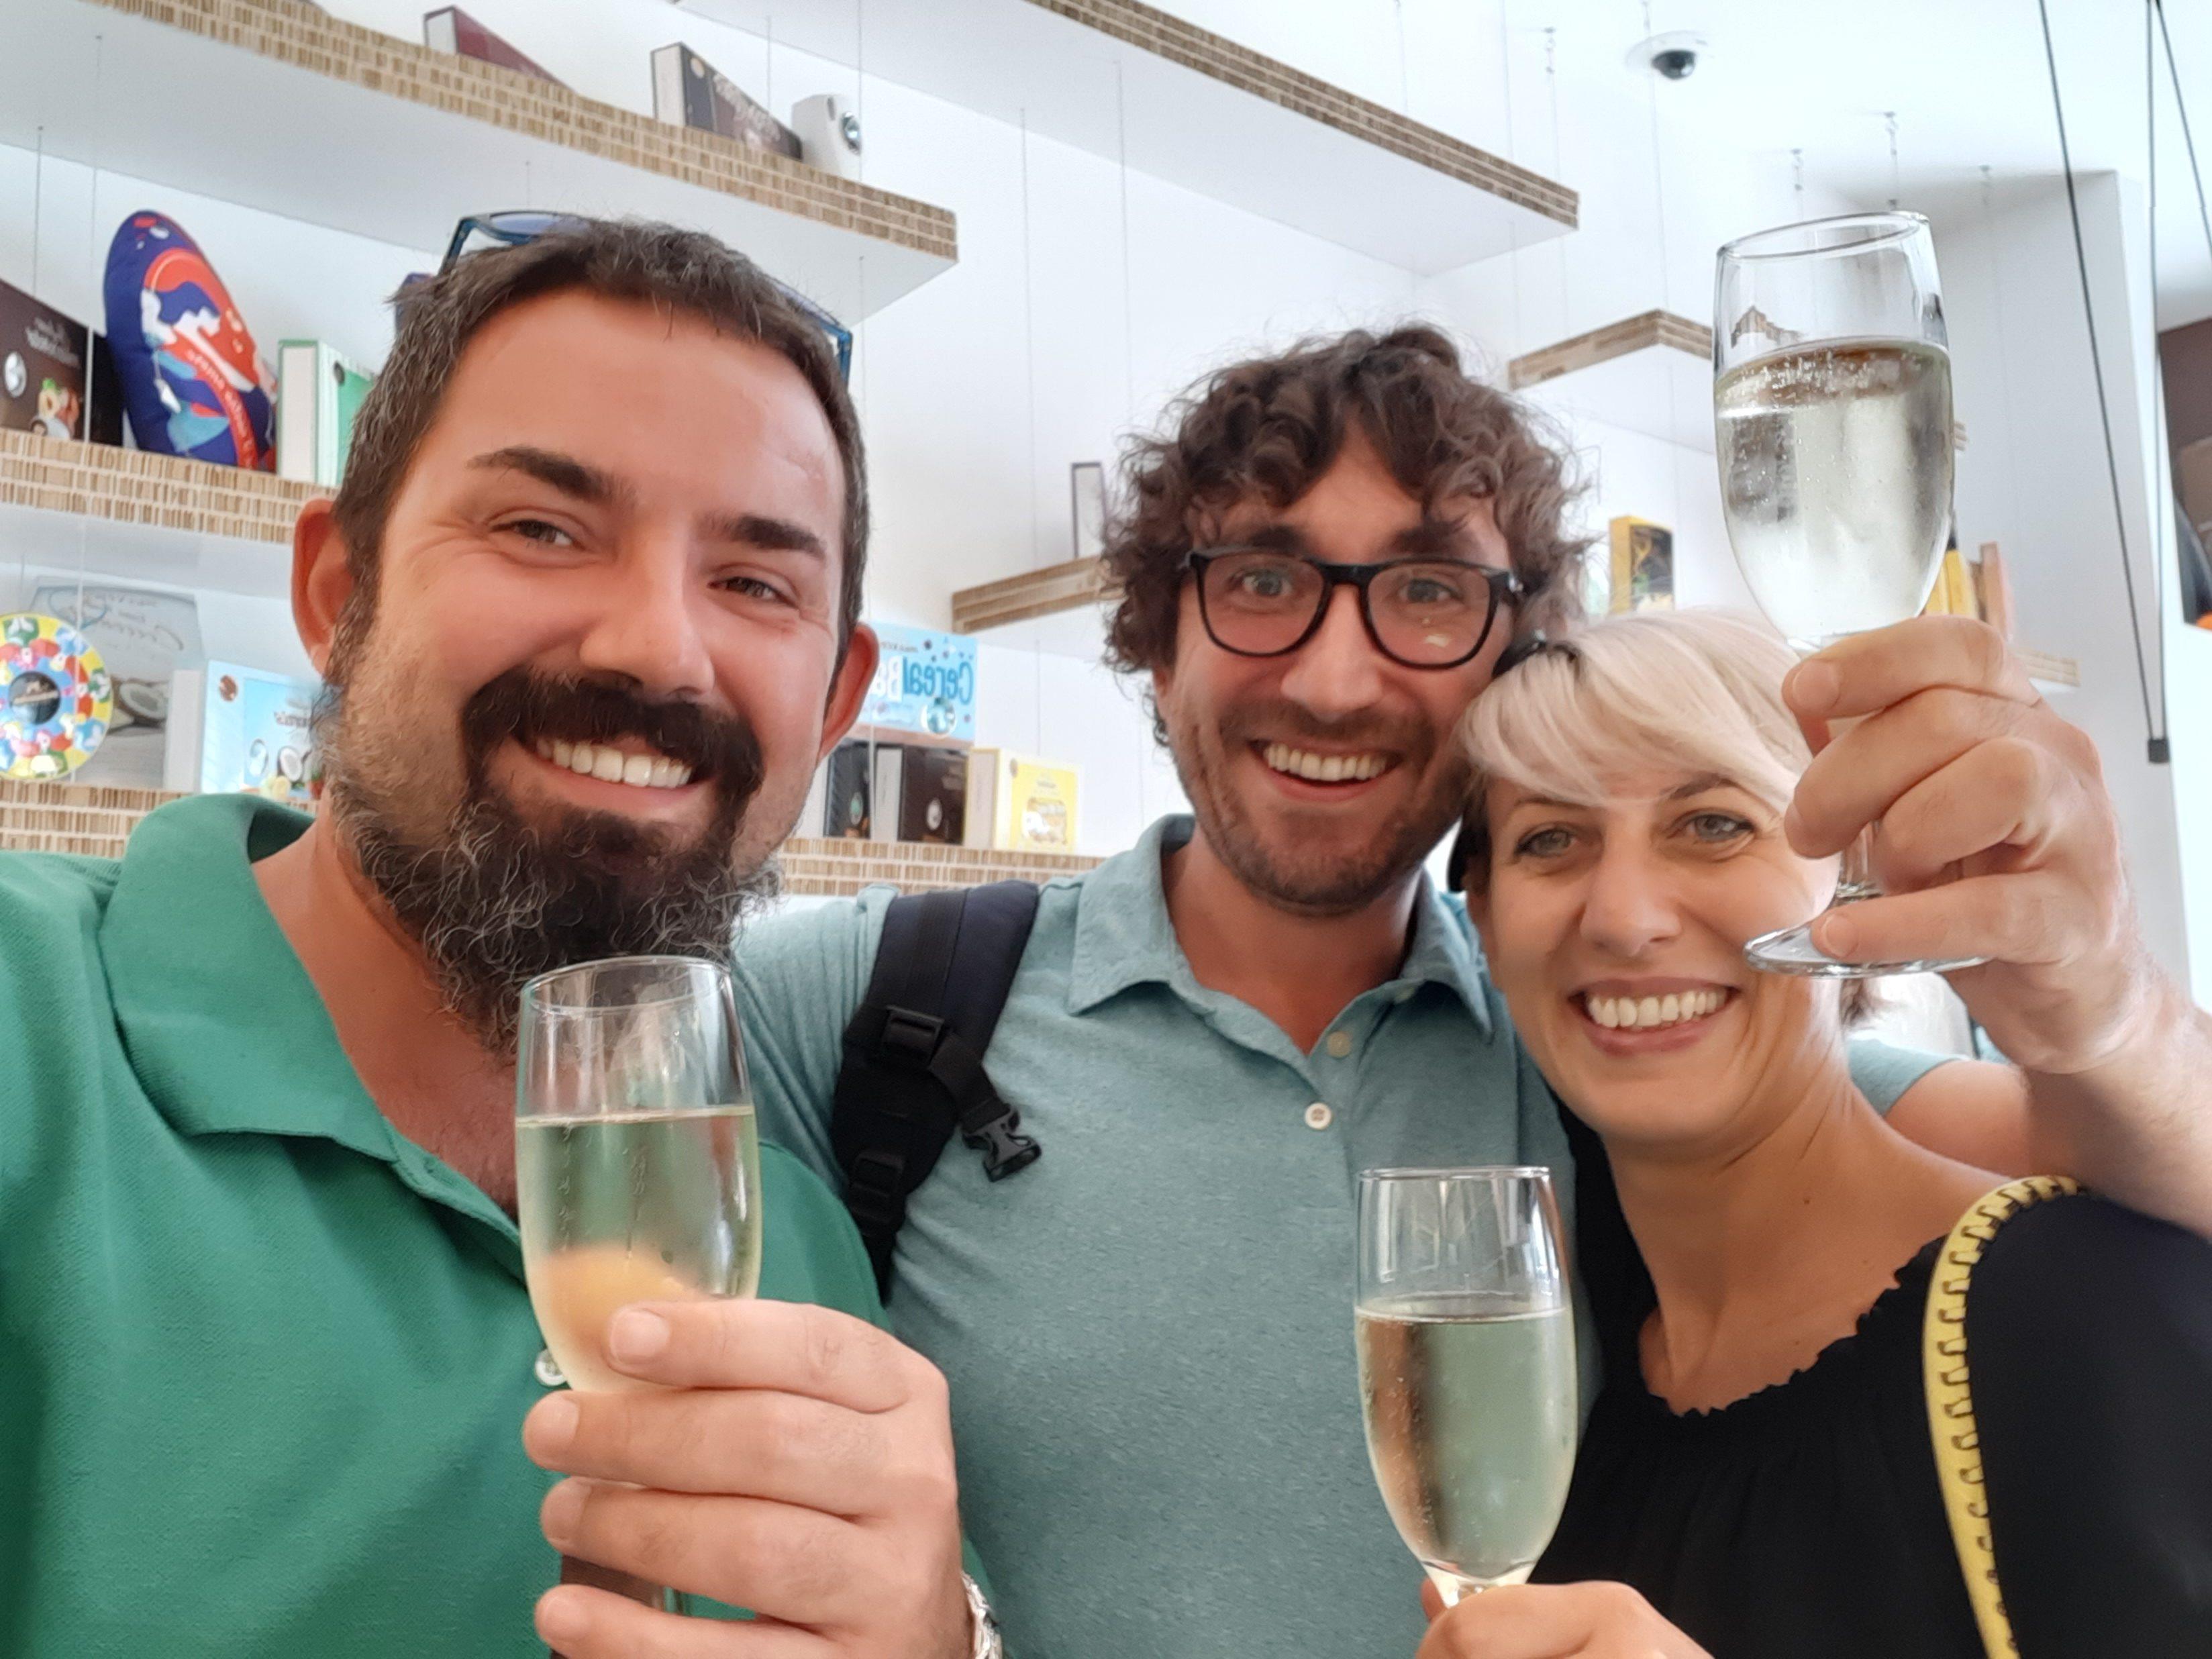 A toast to b4chem